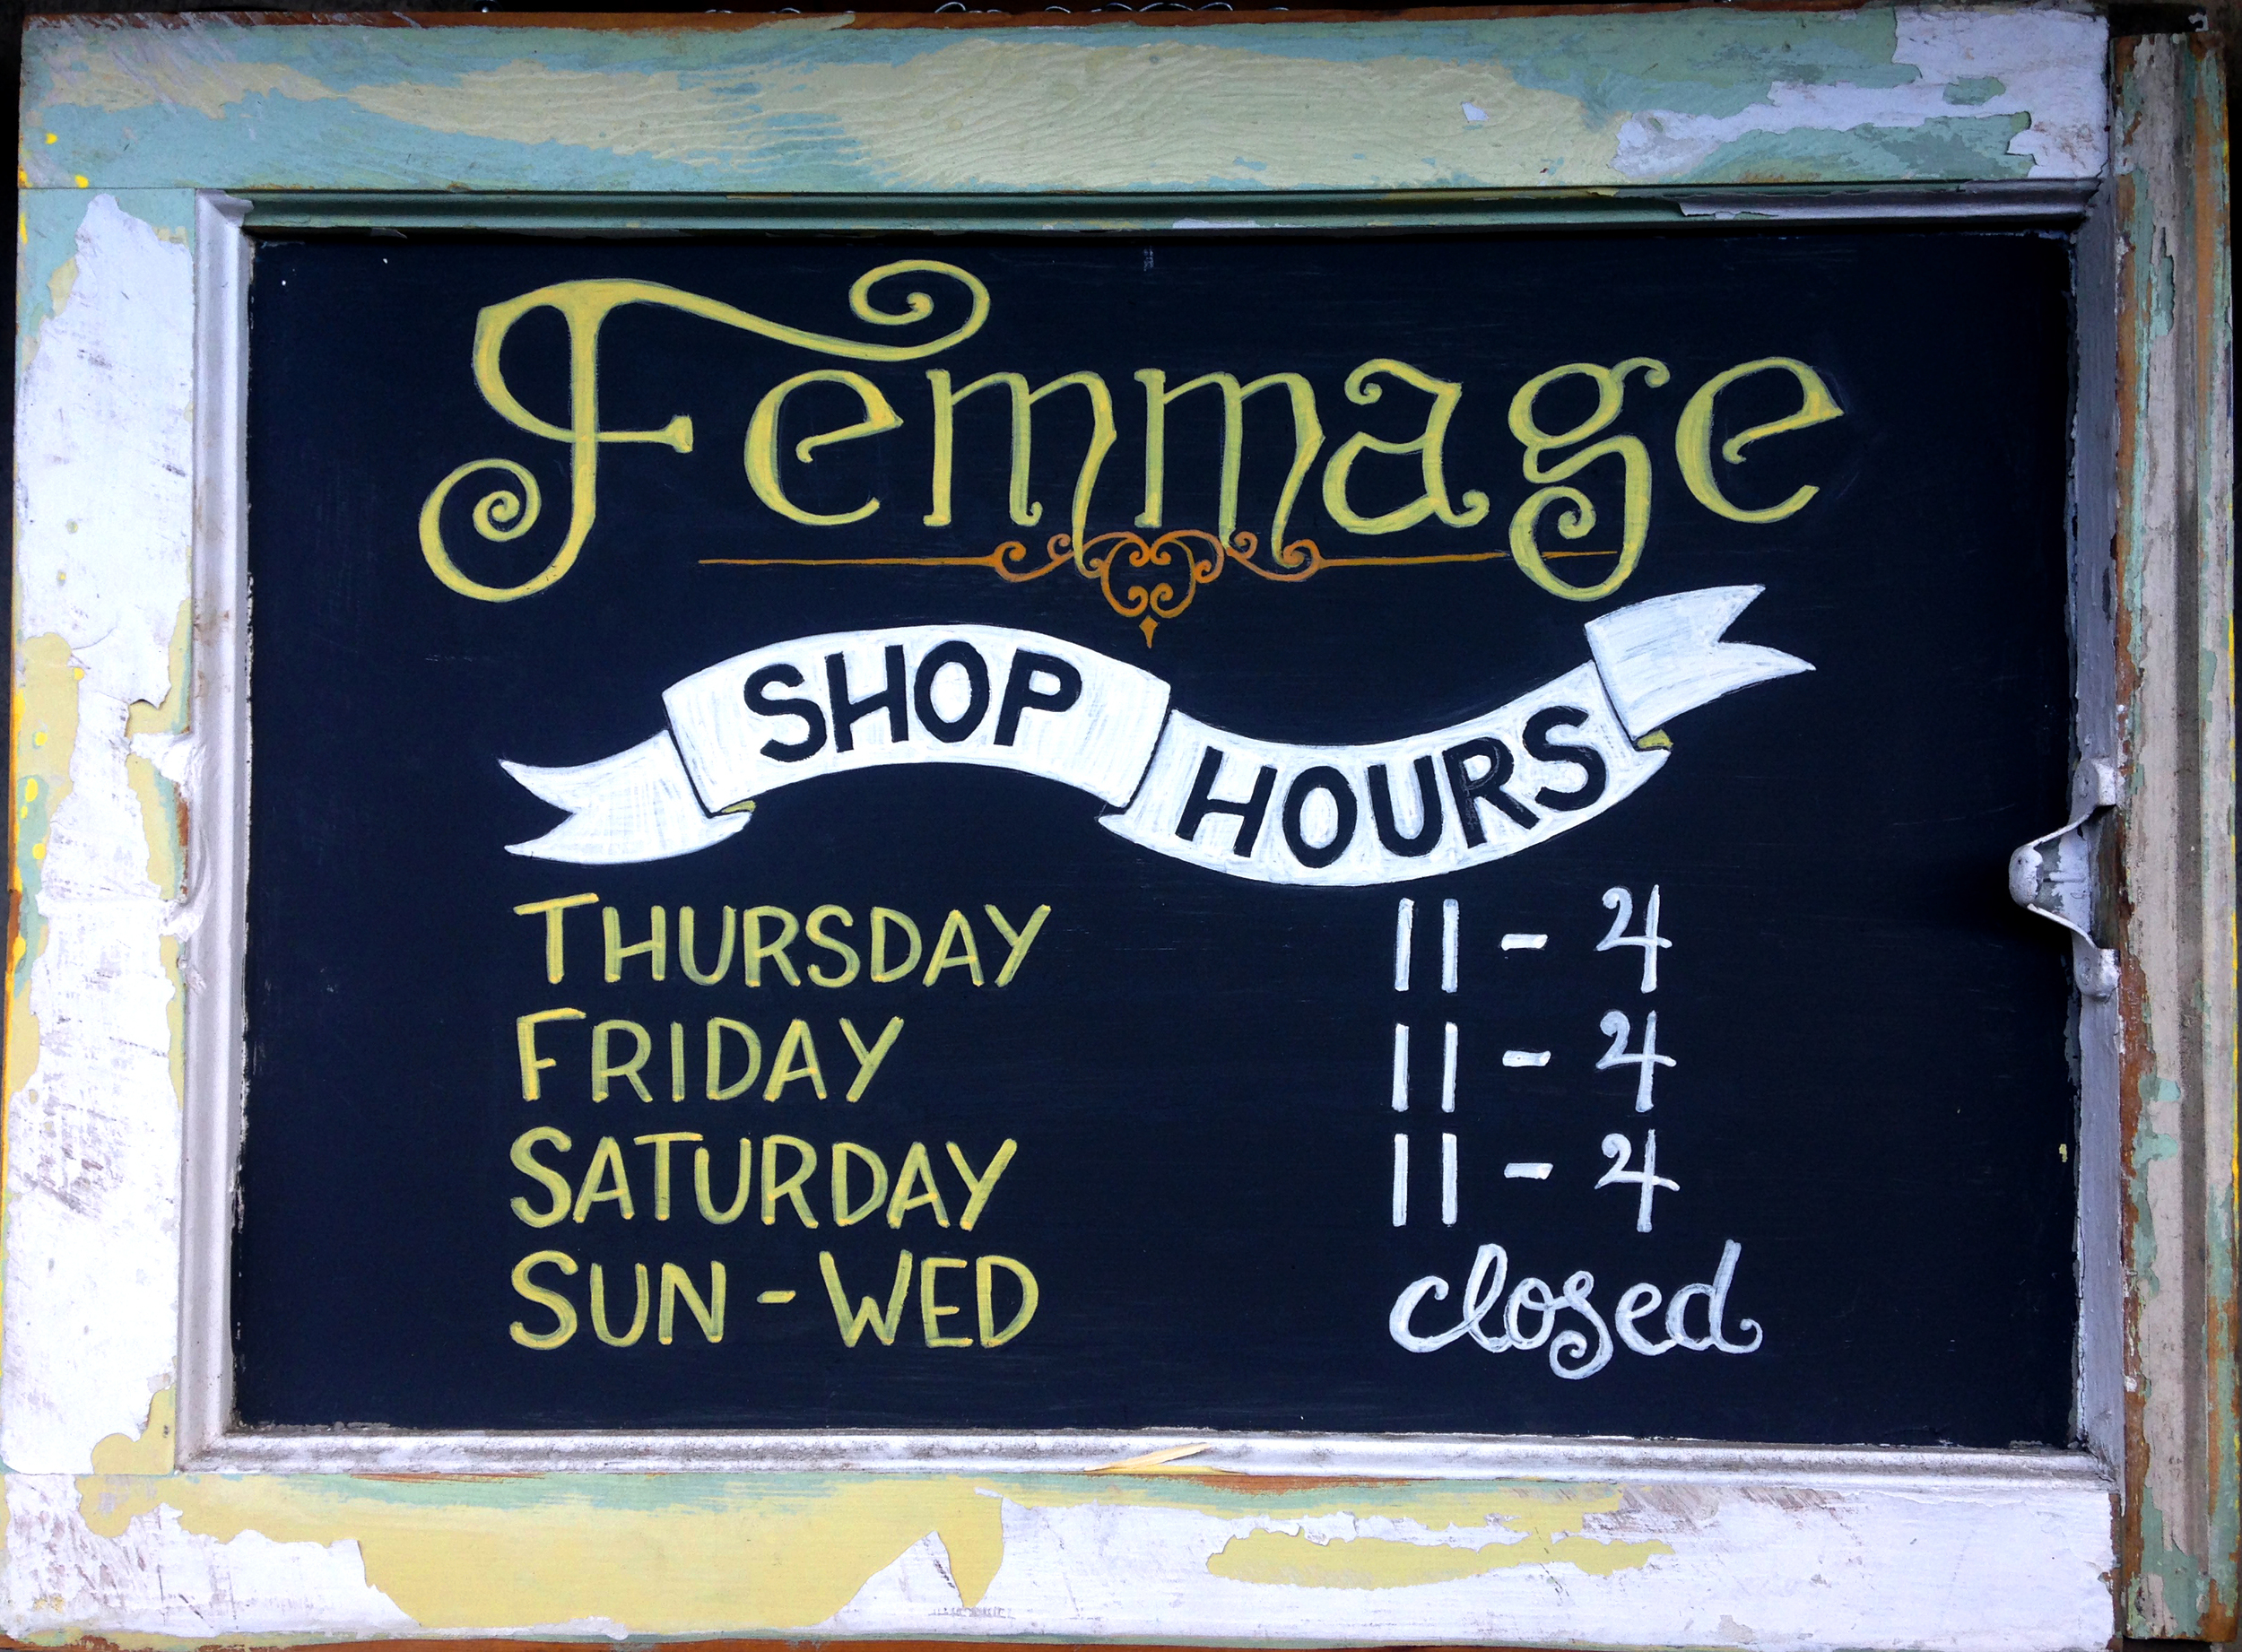 femmage store hours sign.JPG